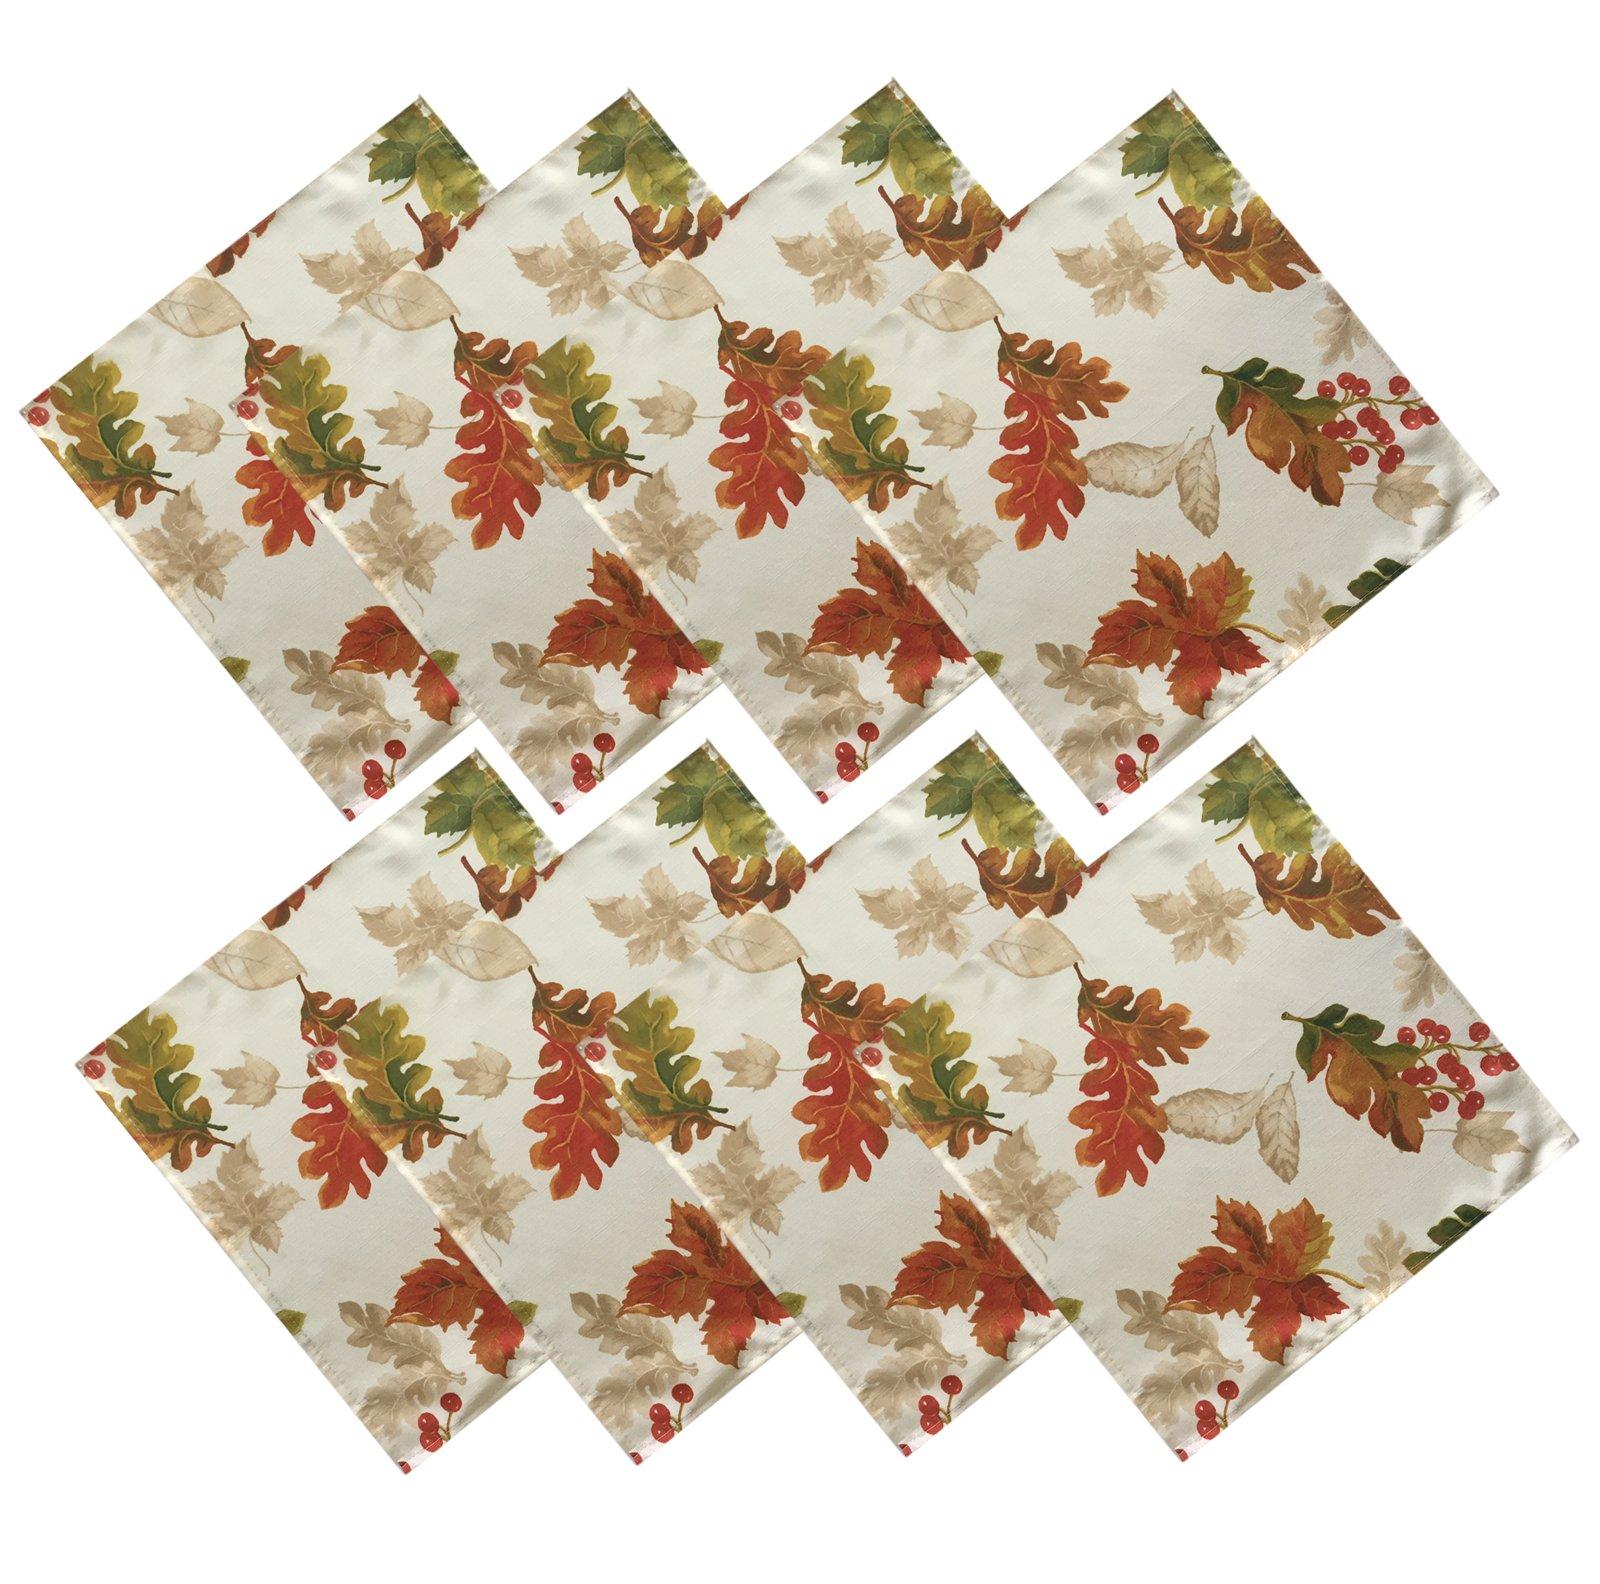 Harvest Swaying Leaves Double Border Autumn Thanksgiving Fabric Print Napkin Set, Set of 8 Napkins